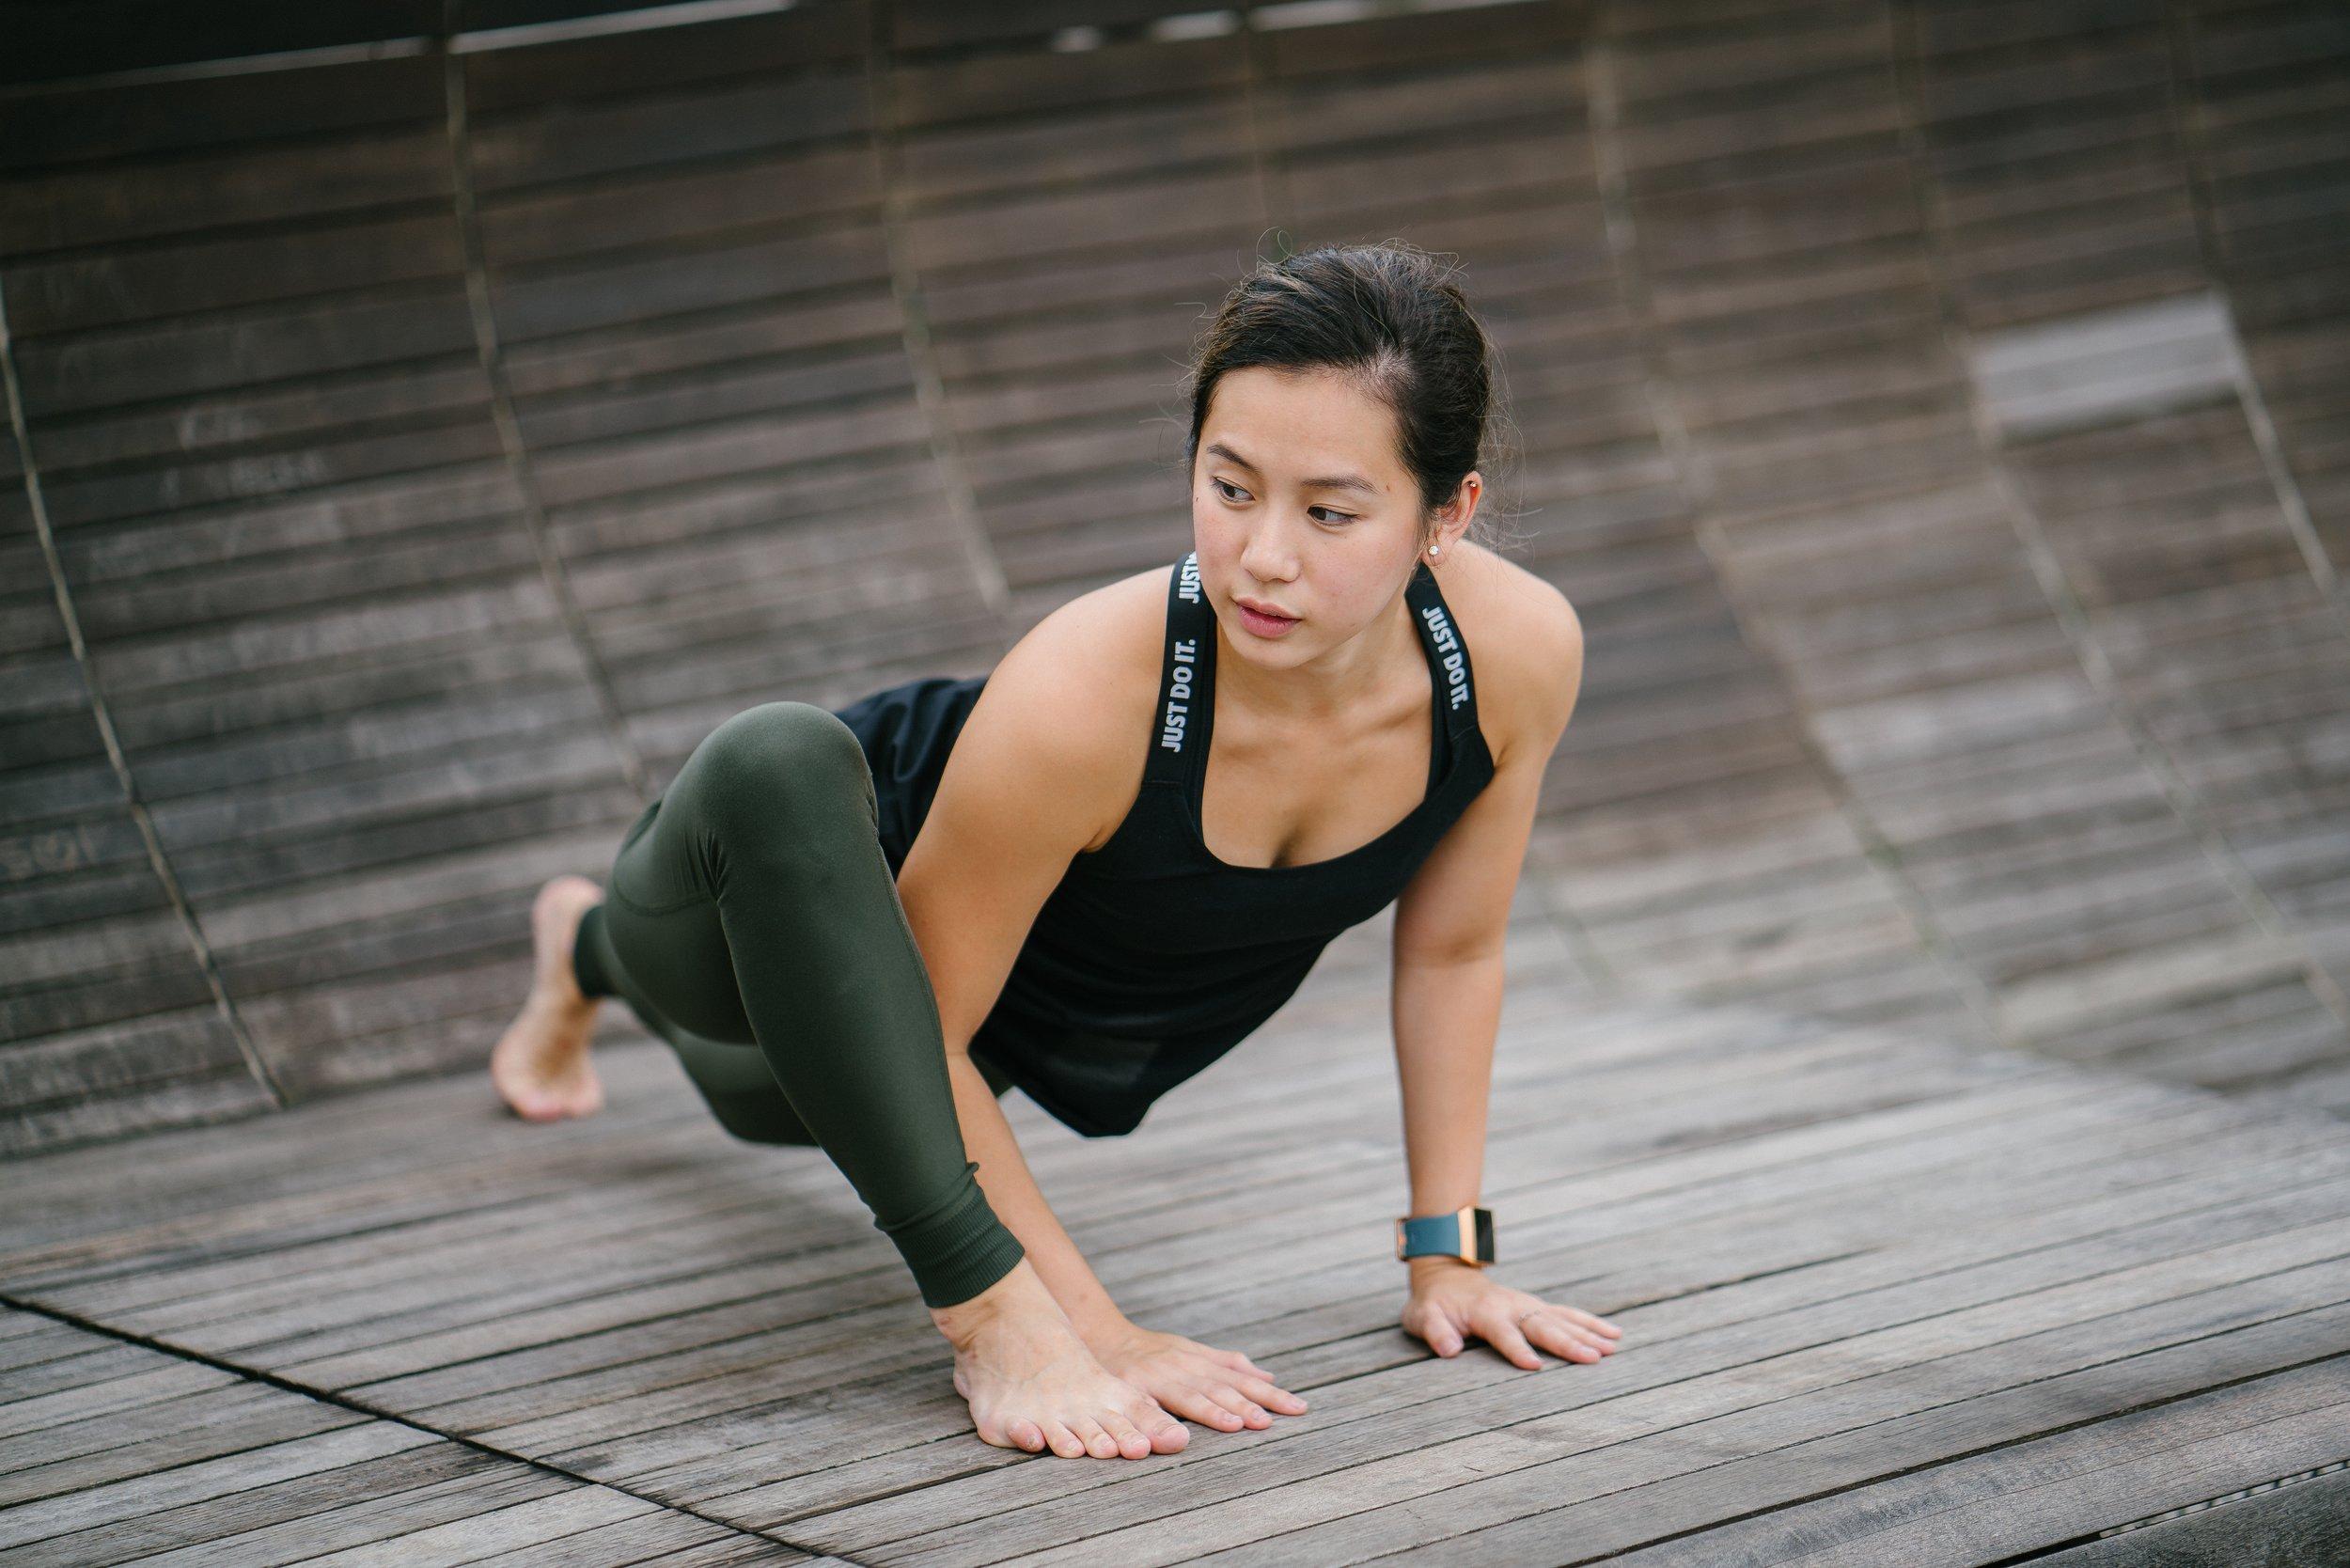 active-adult-athlete-1033373 copy.jpg